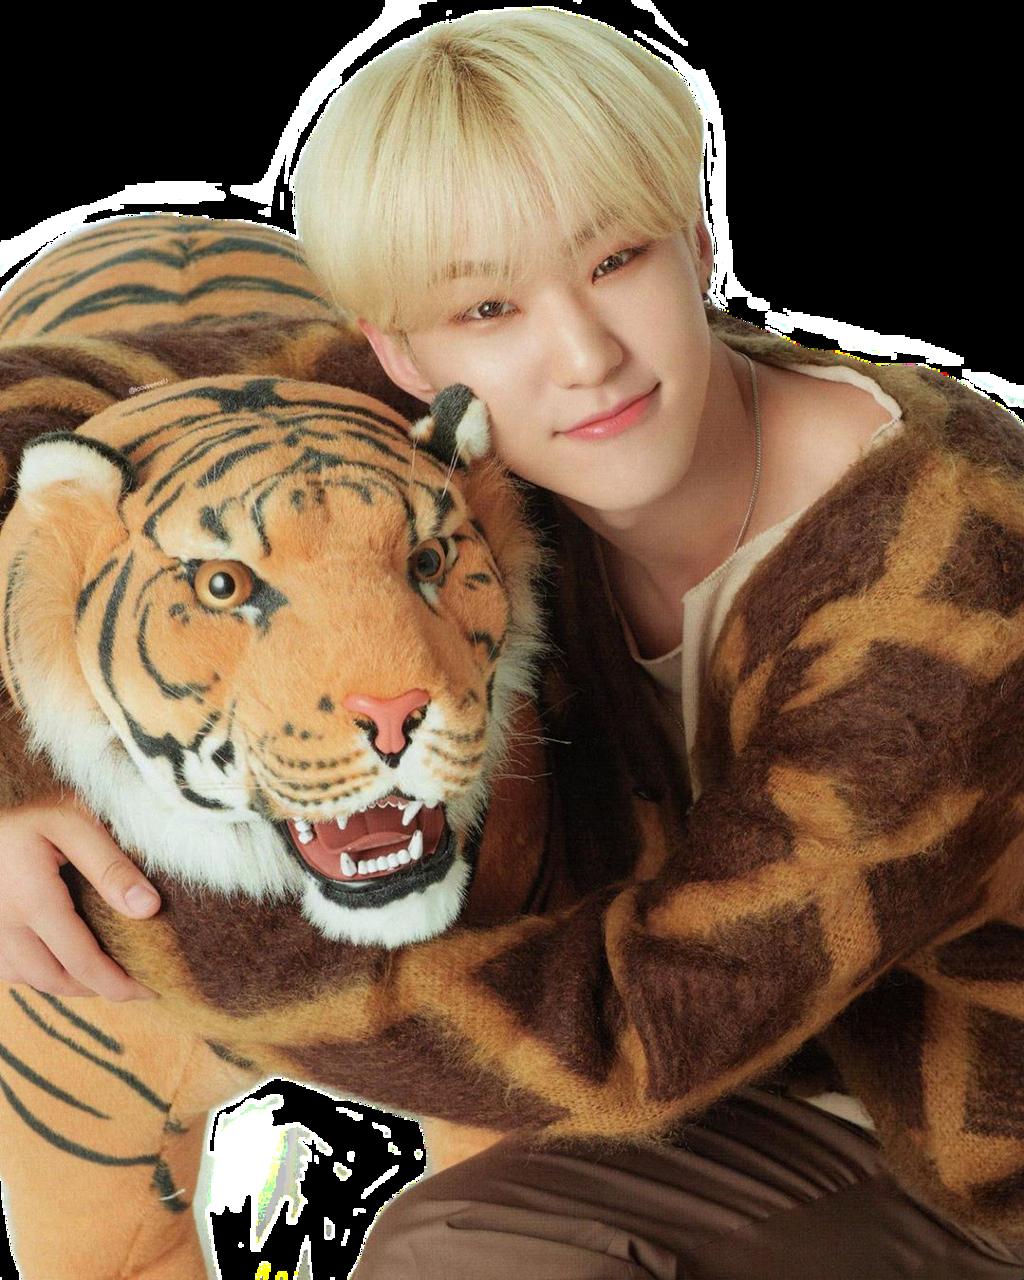 #hoshi#hoshiseventeen#hoshisvt#hoshi17#seventeenhoshi#svthoshi#kwonsoonyoung#seventeen#carat#seventeenkpop#kpop#10:10#tiger#tigereyes#prince#princehoshi